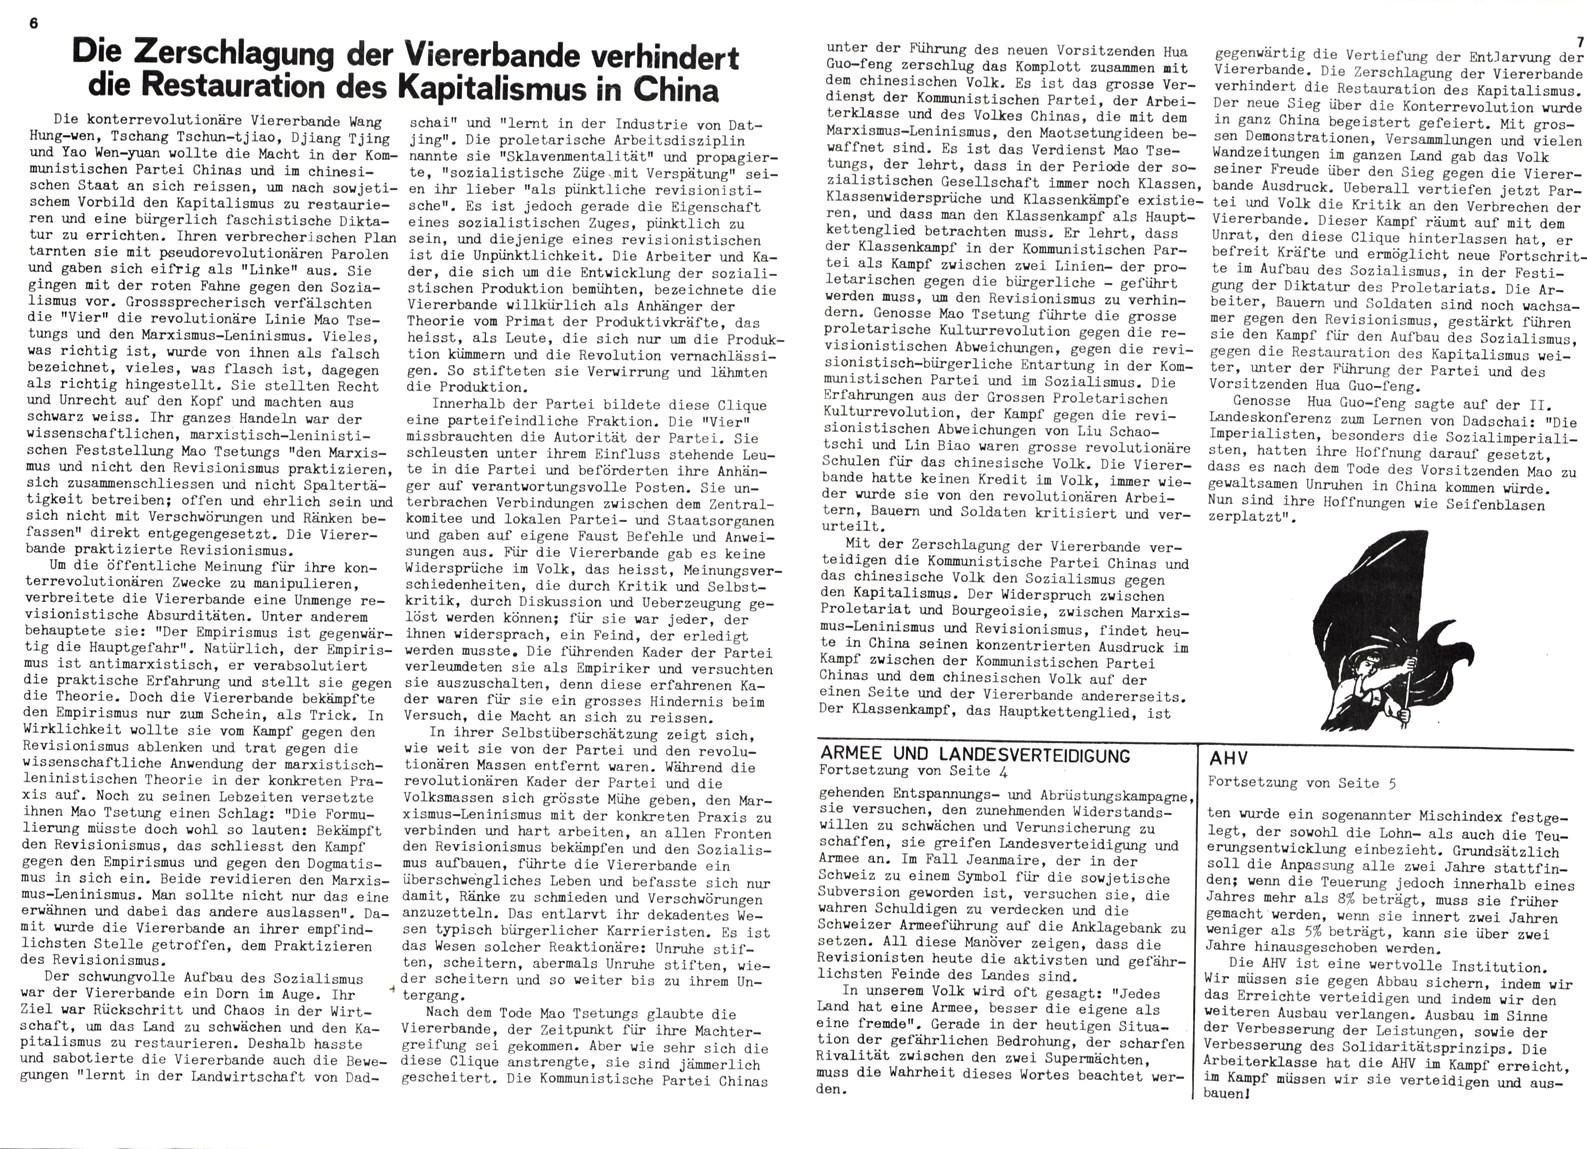 Schweiz_KPSML_Oktober_19770500_110_004